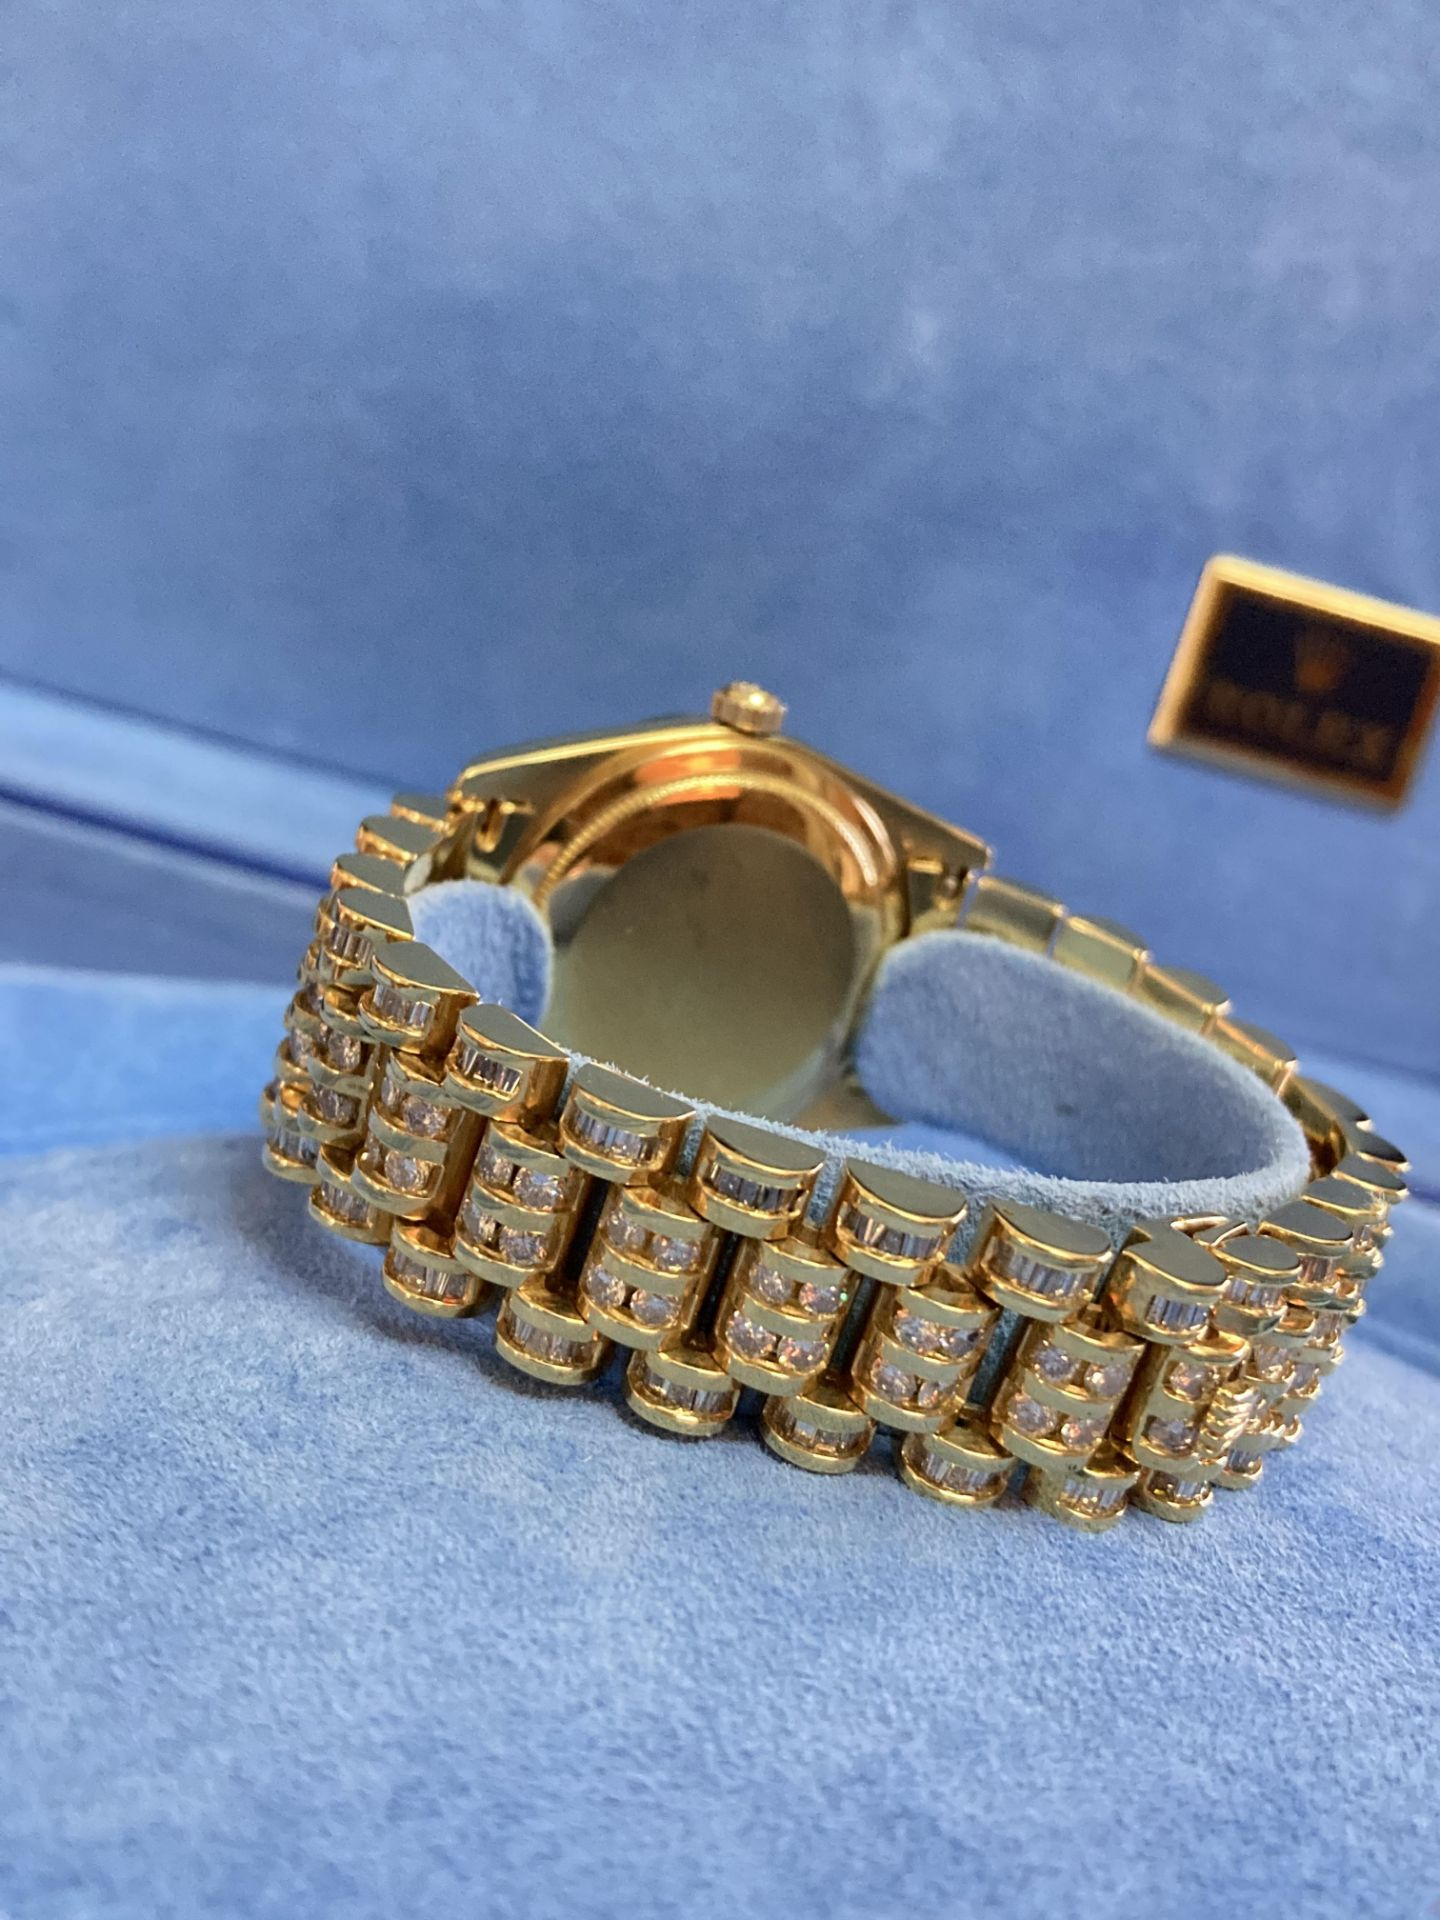 GENTS 36mm ROLEX DAYDATE YELLOW GOLD DIAMOND WATCH - Image 12 of 21